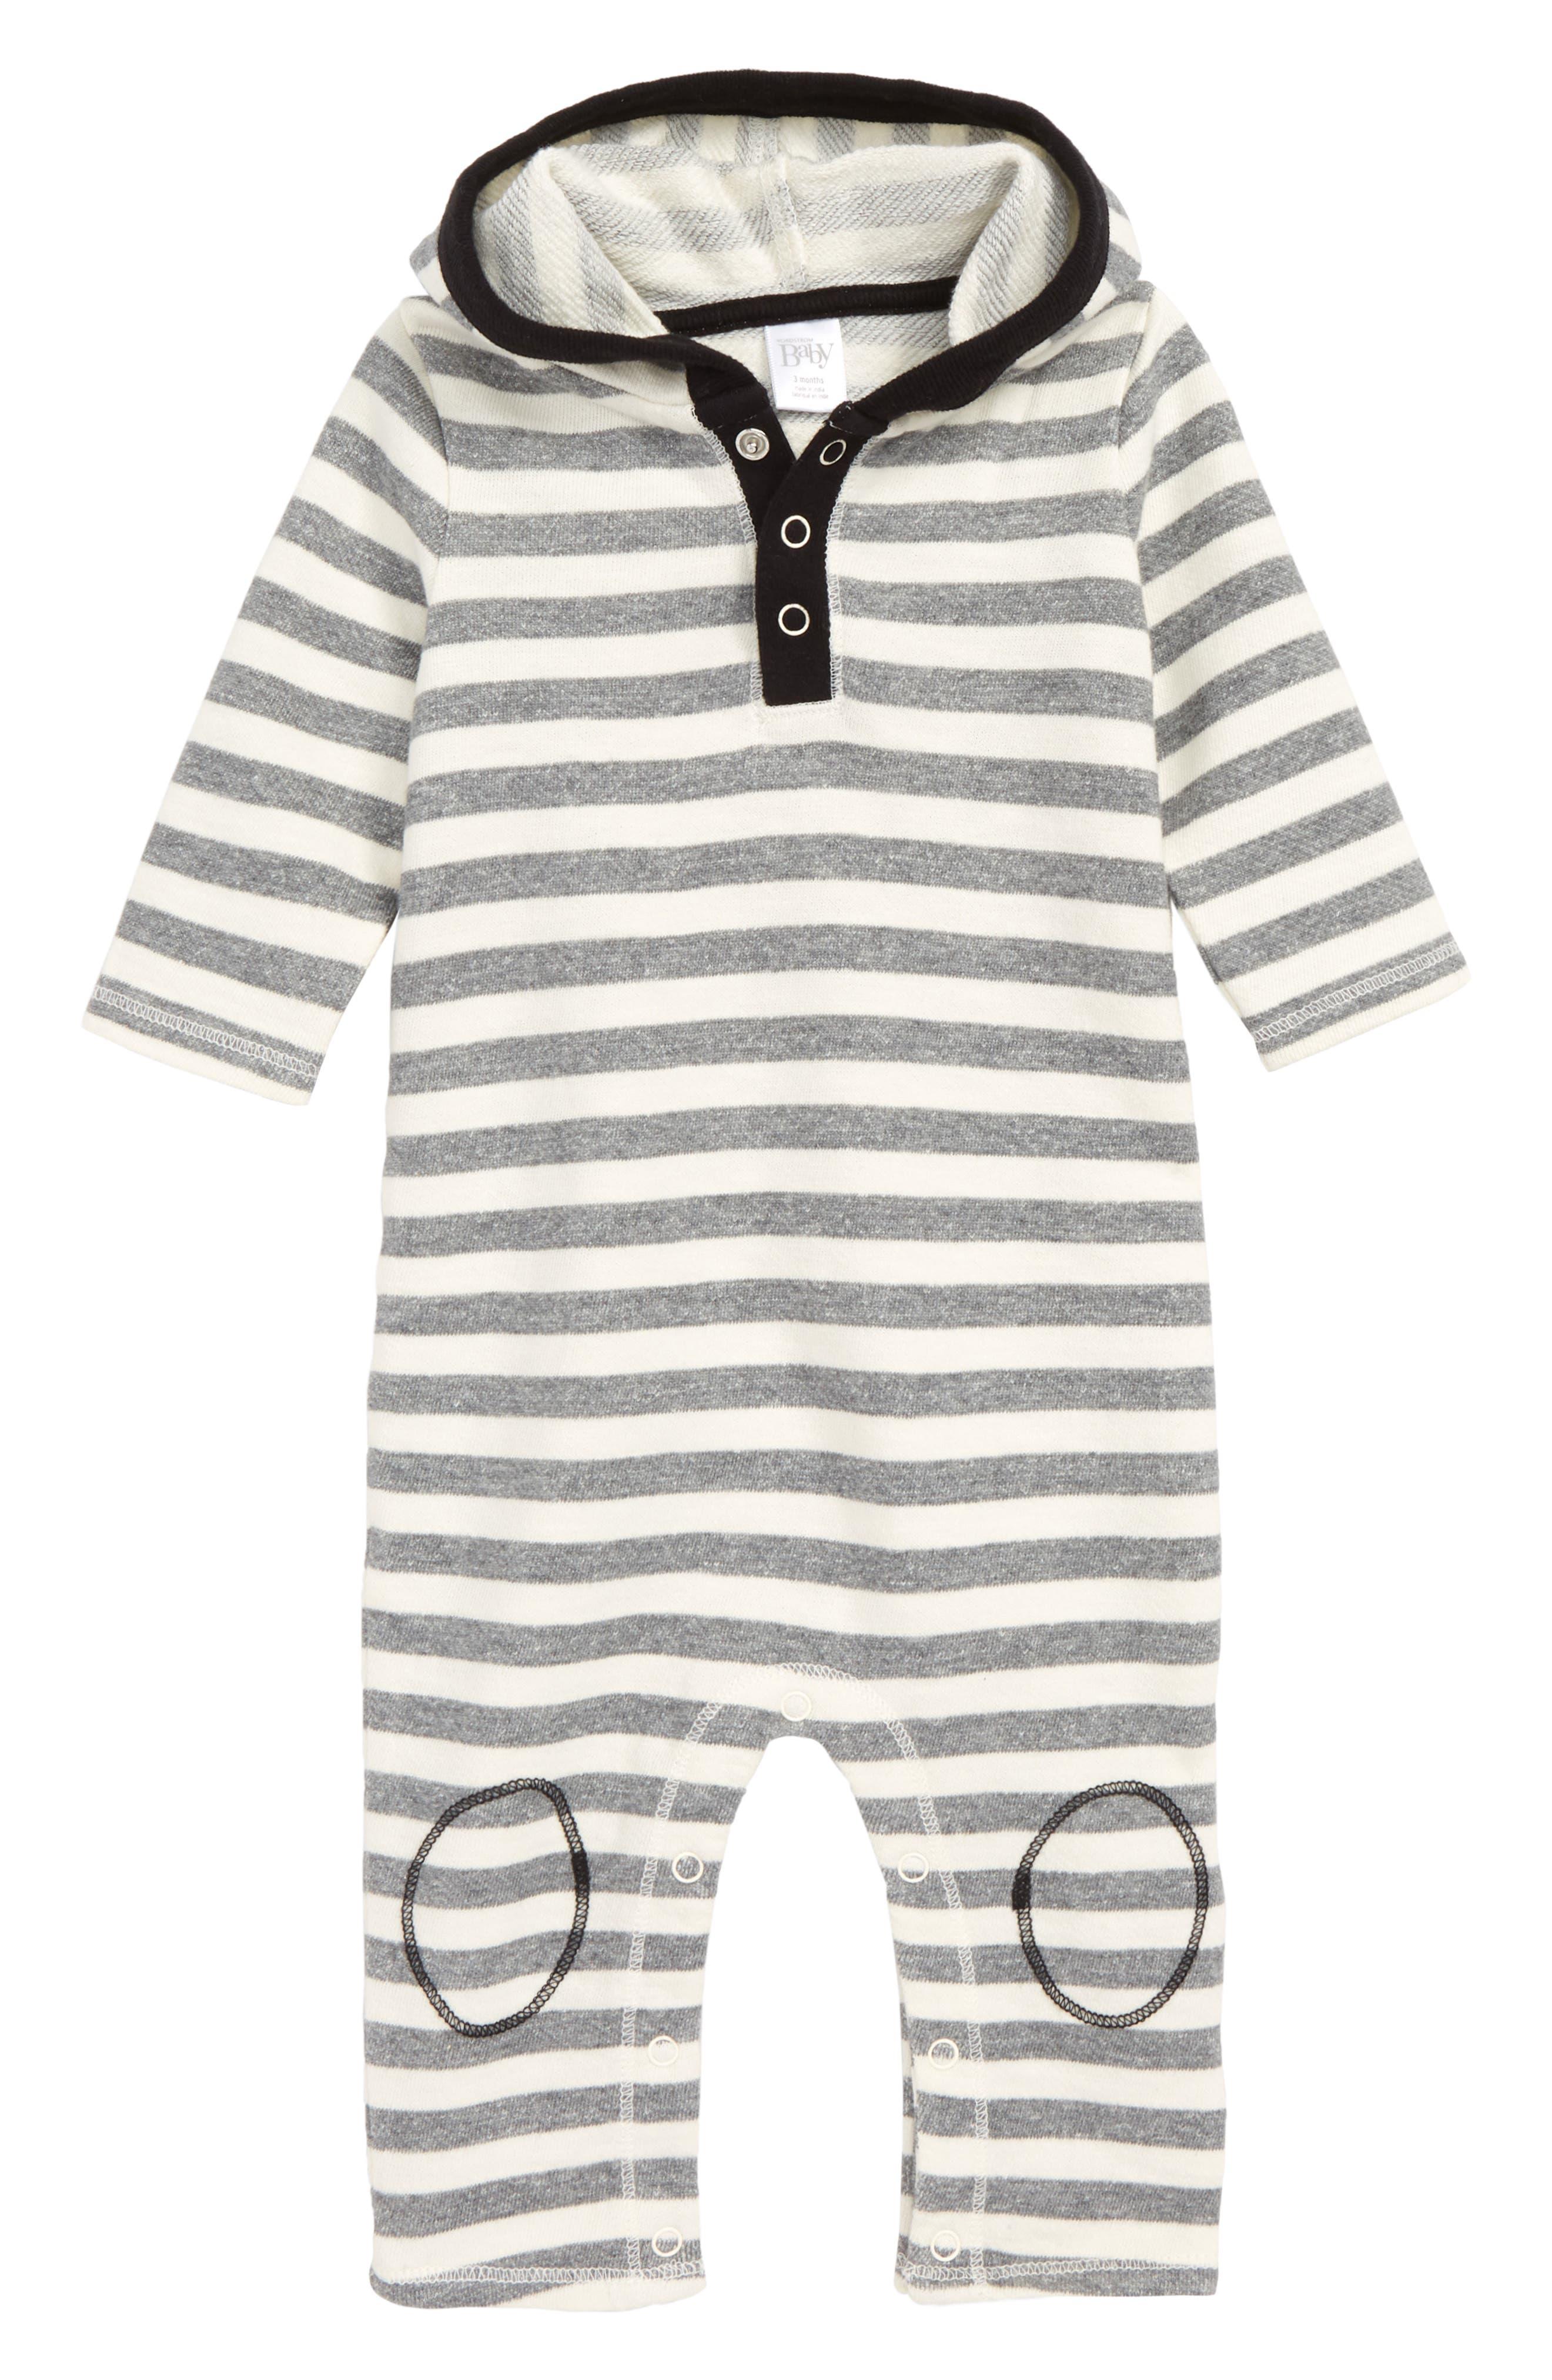 NORDSTROM BABY Stripe Hooded Romper, Main, color, 900